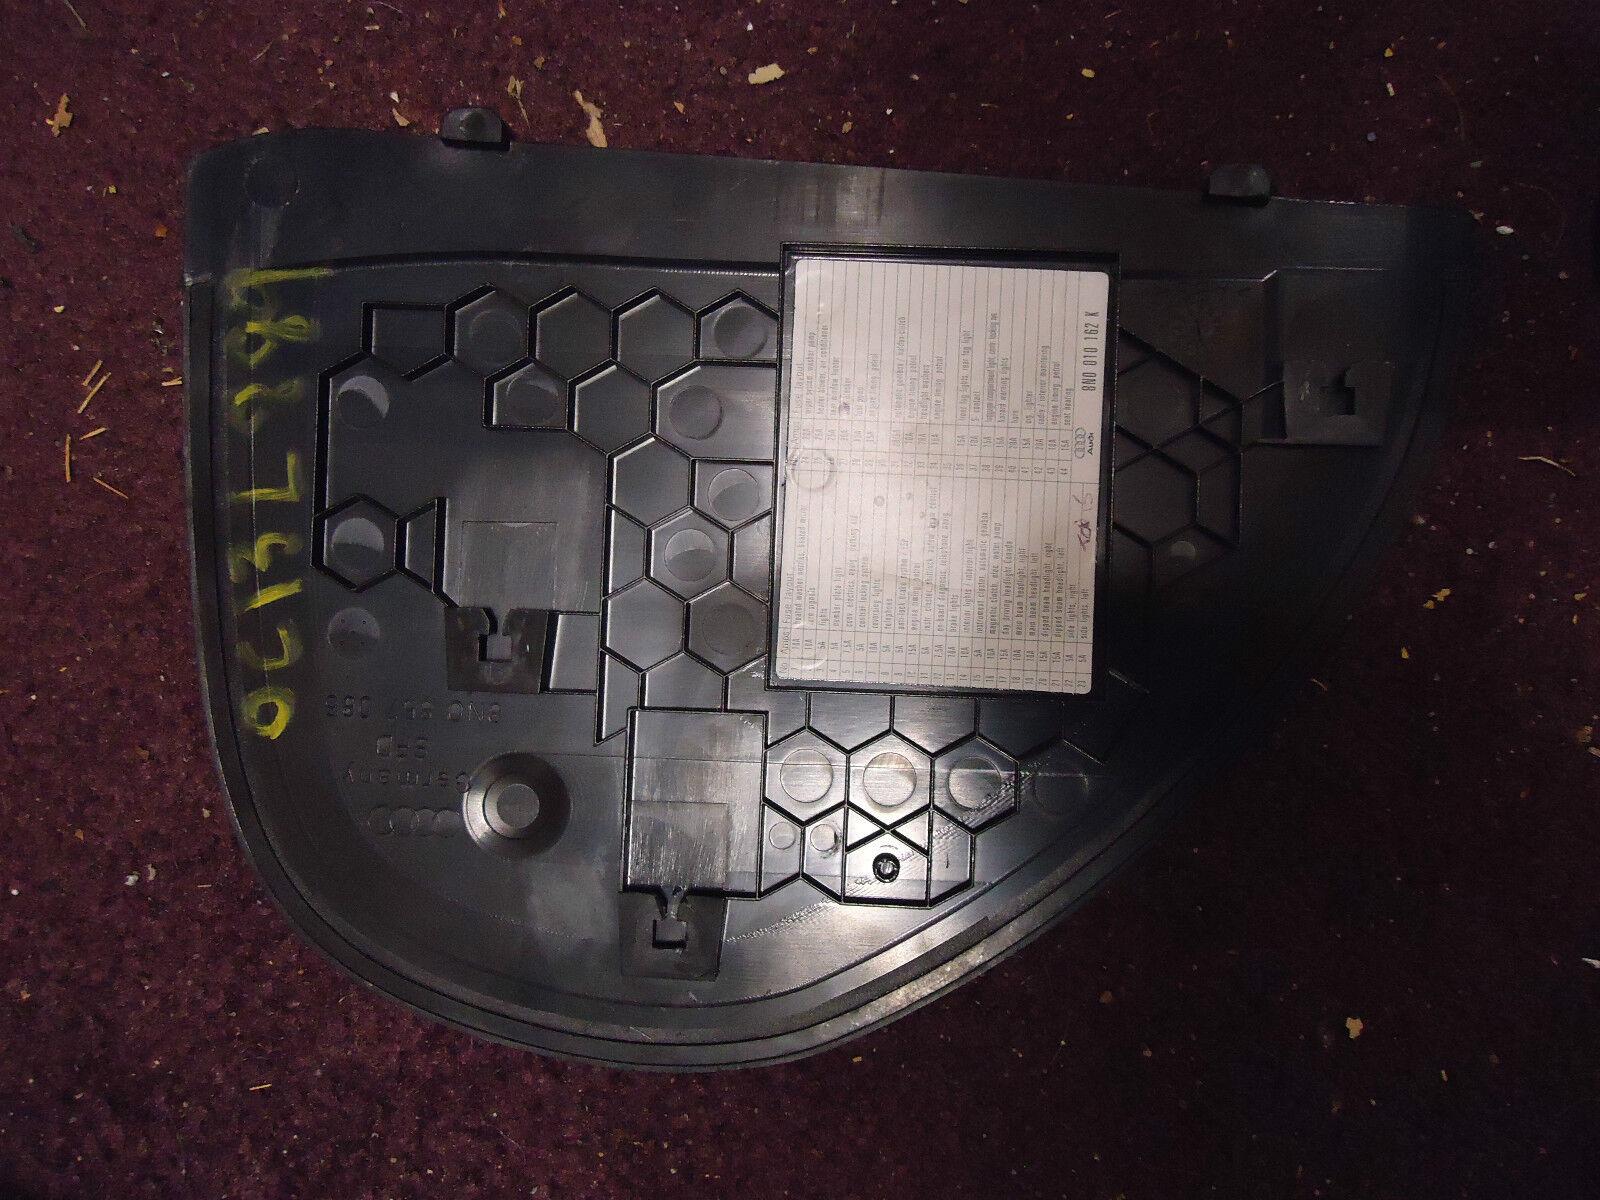 Tt Mk1 Fuse Box Wiring Library Audi Under Hood Dash End Cap Panel Cover Trim 8n0 857 085 Ebay